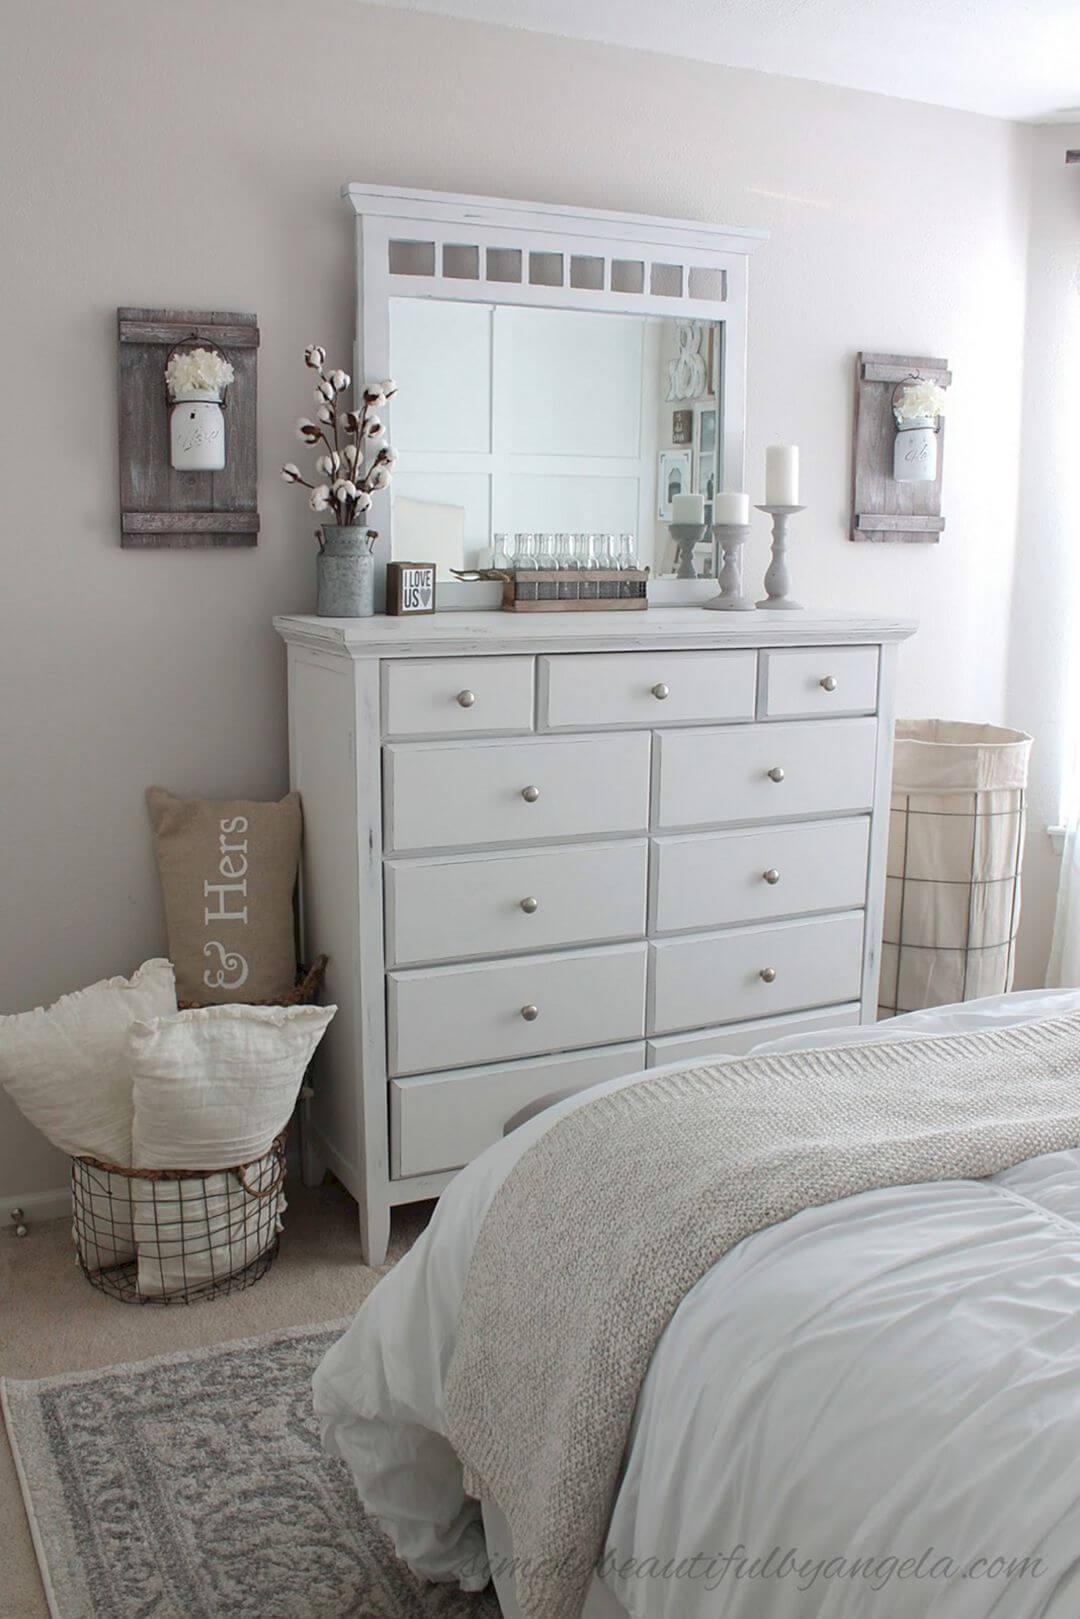 Awesome Rustic Chic Bedroom Designs - DIYCraftsGuru